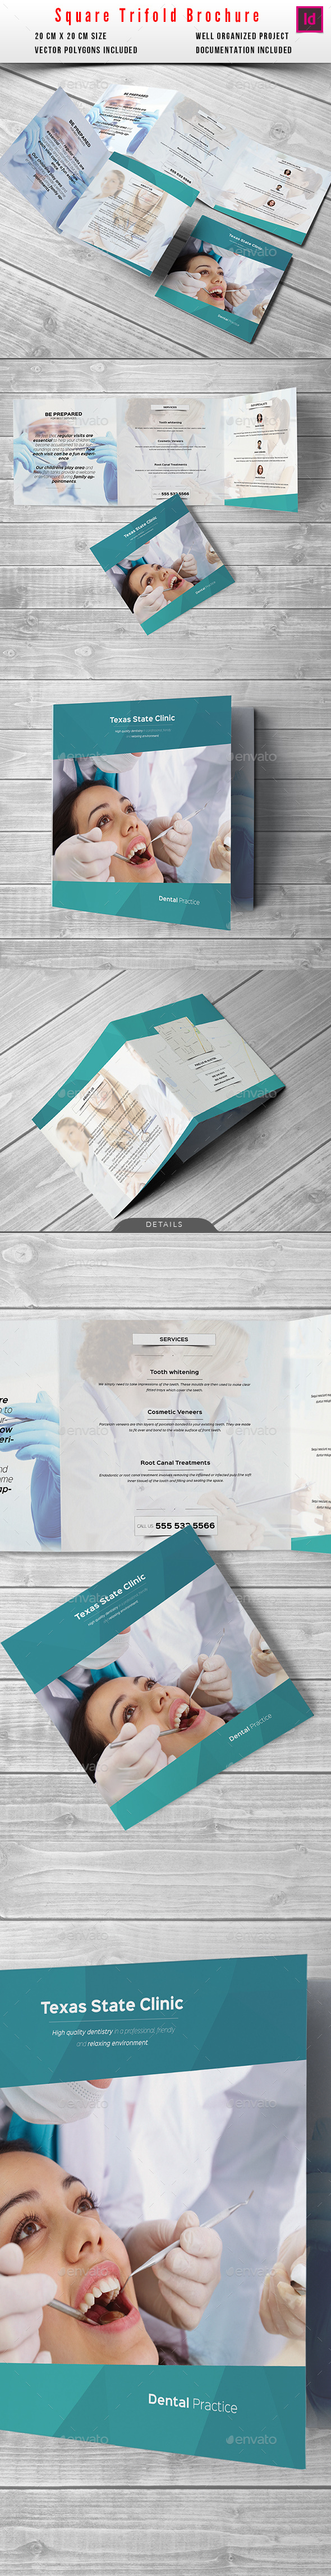 Medical Square Trifold Brochure - Informational Brochures